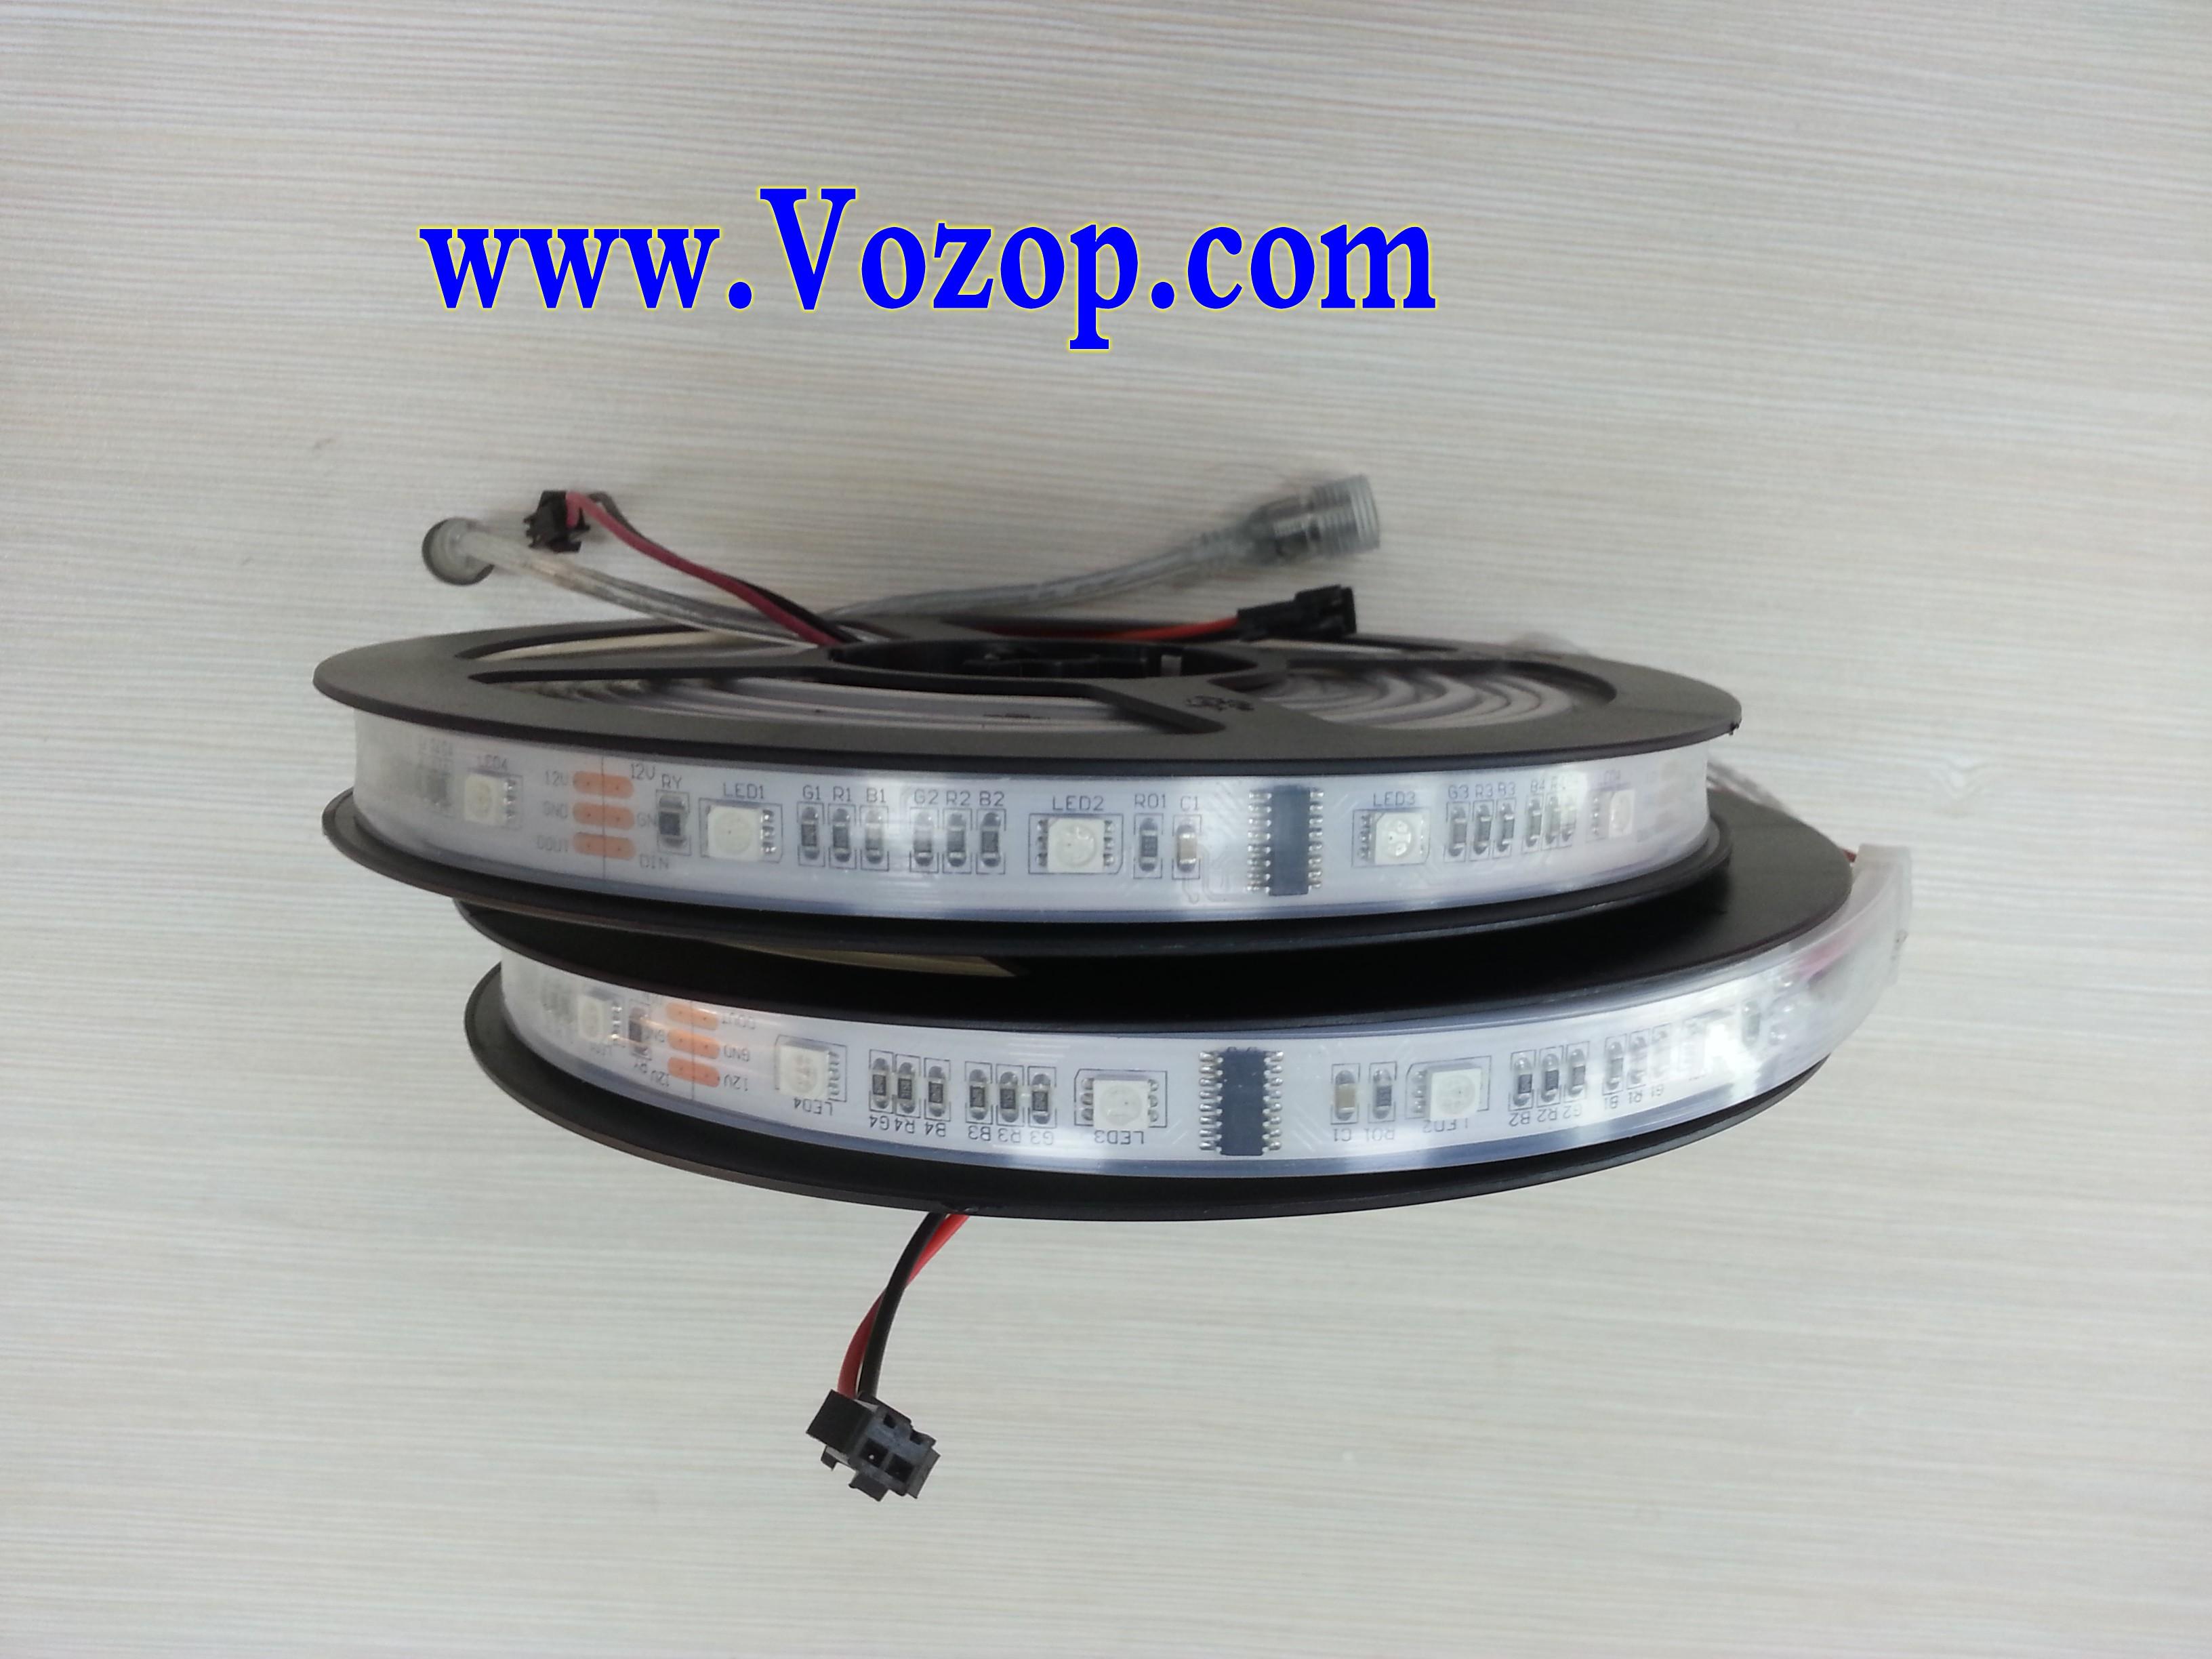 Waterproof_5M_Intelligent_TM1812_RGB_5050_Programmable_LED_Strip